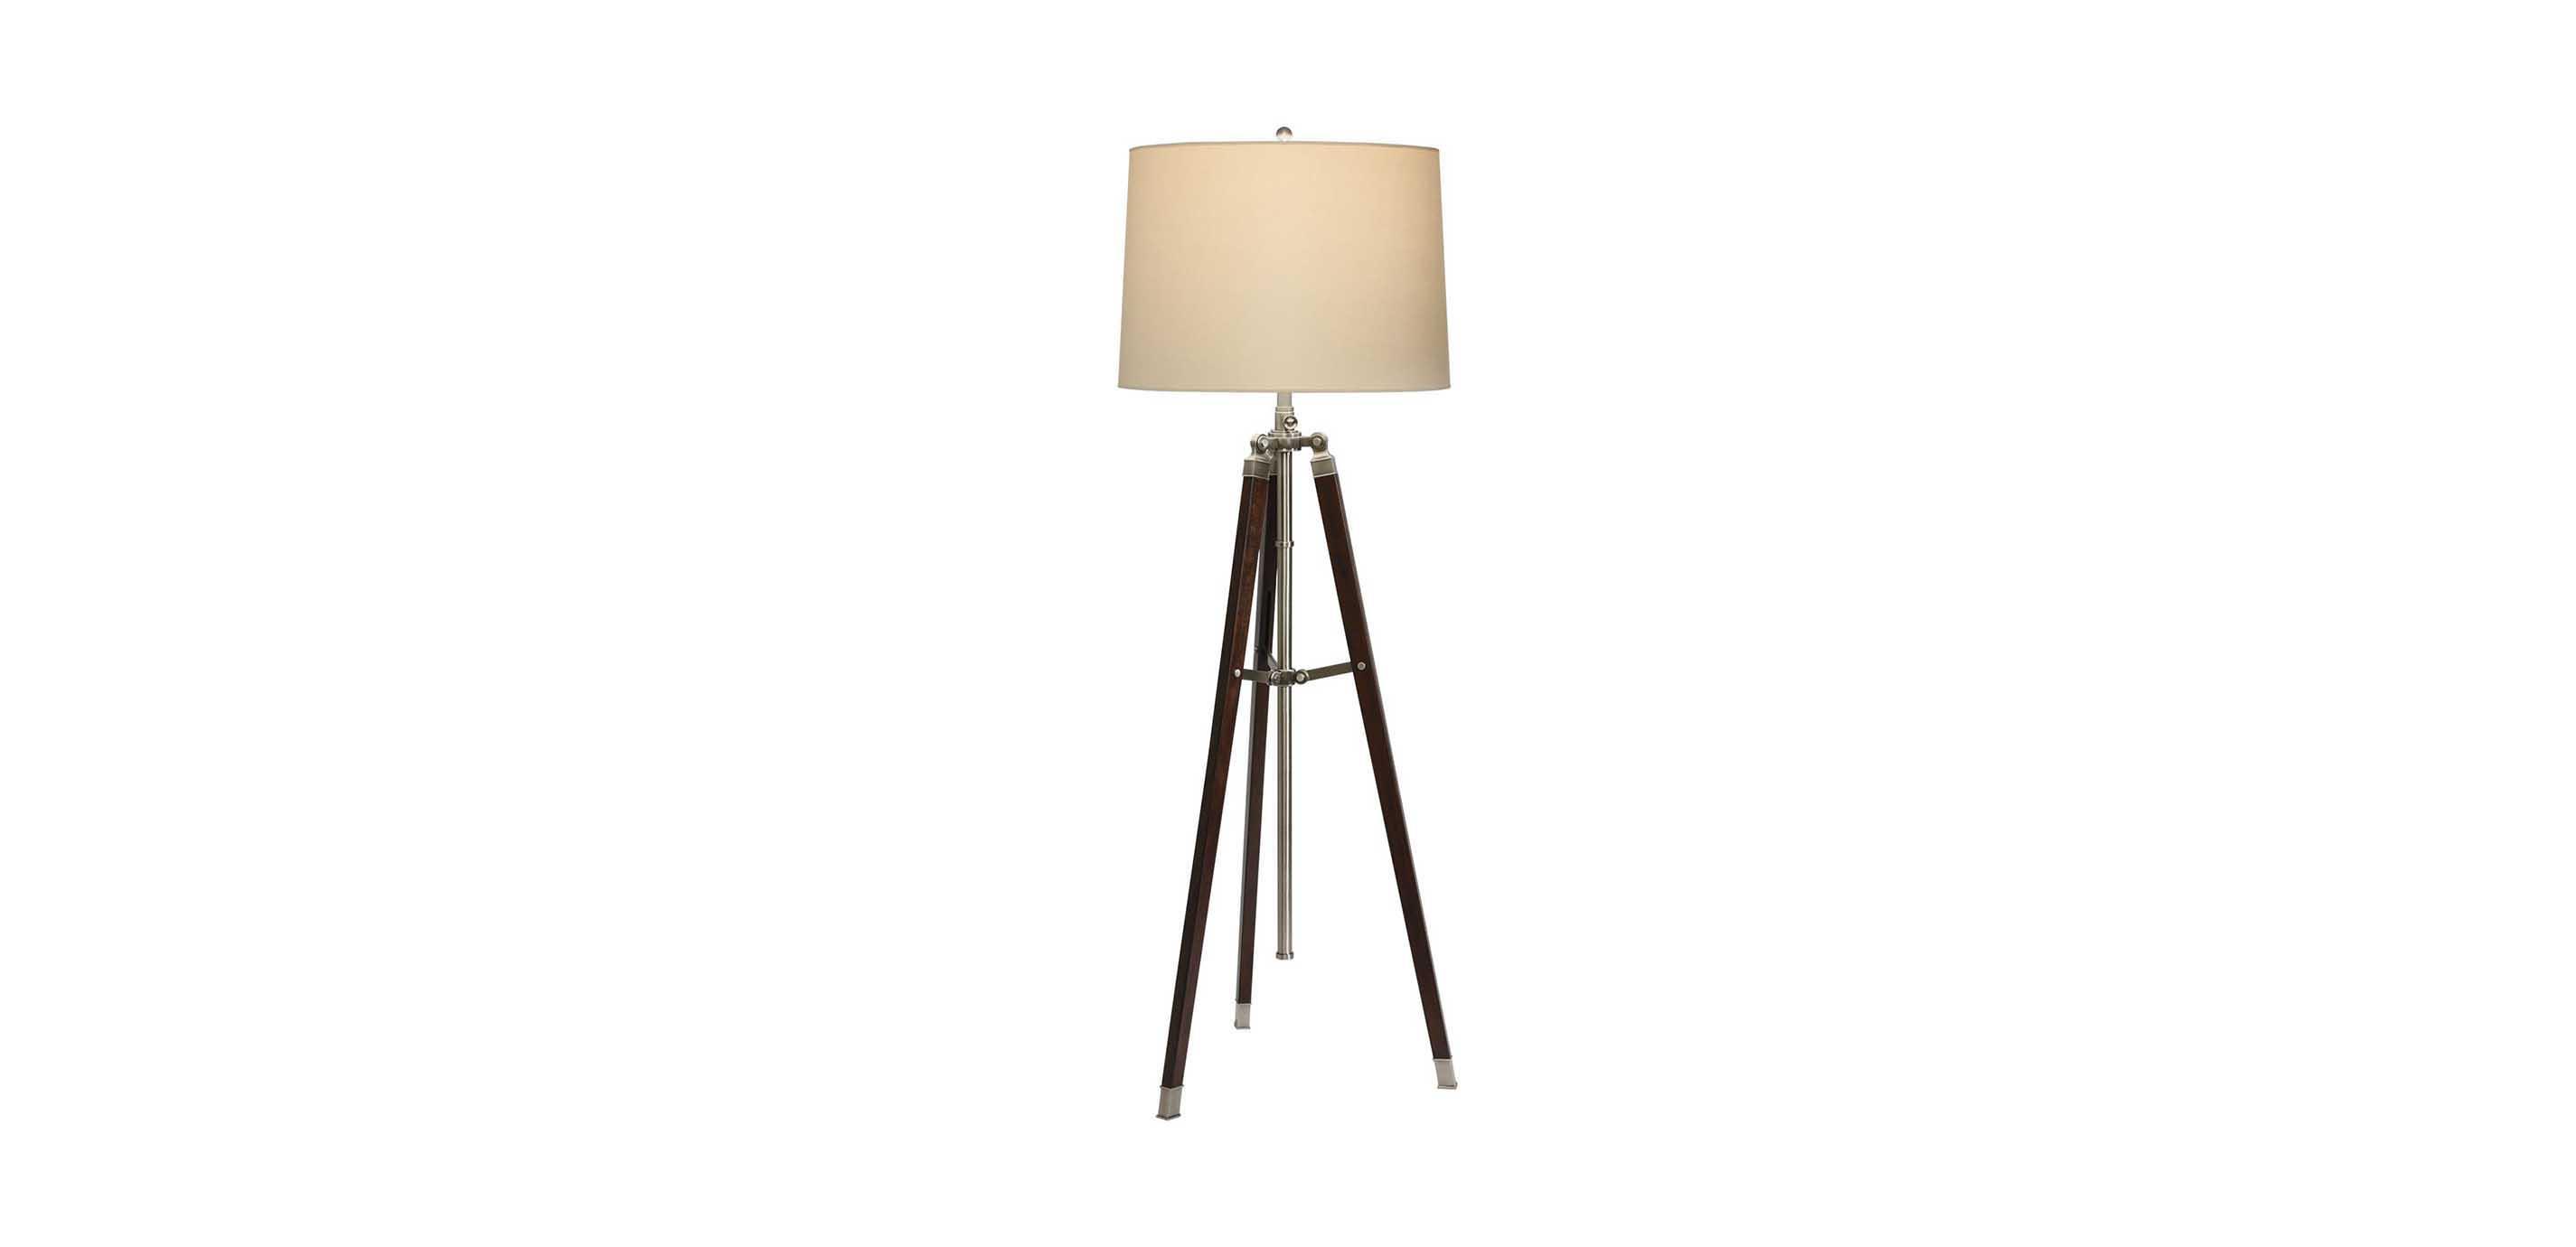 Surveyors Floor Lamp - Ethan Allen:Images Surveyor's Floor Lamp , , large_gray,Lighting